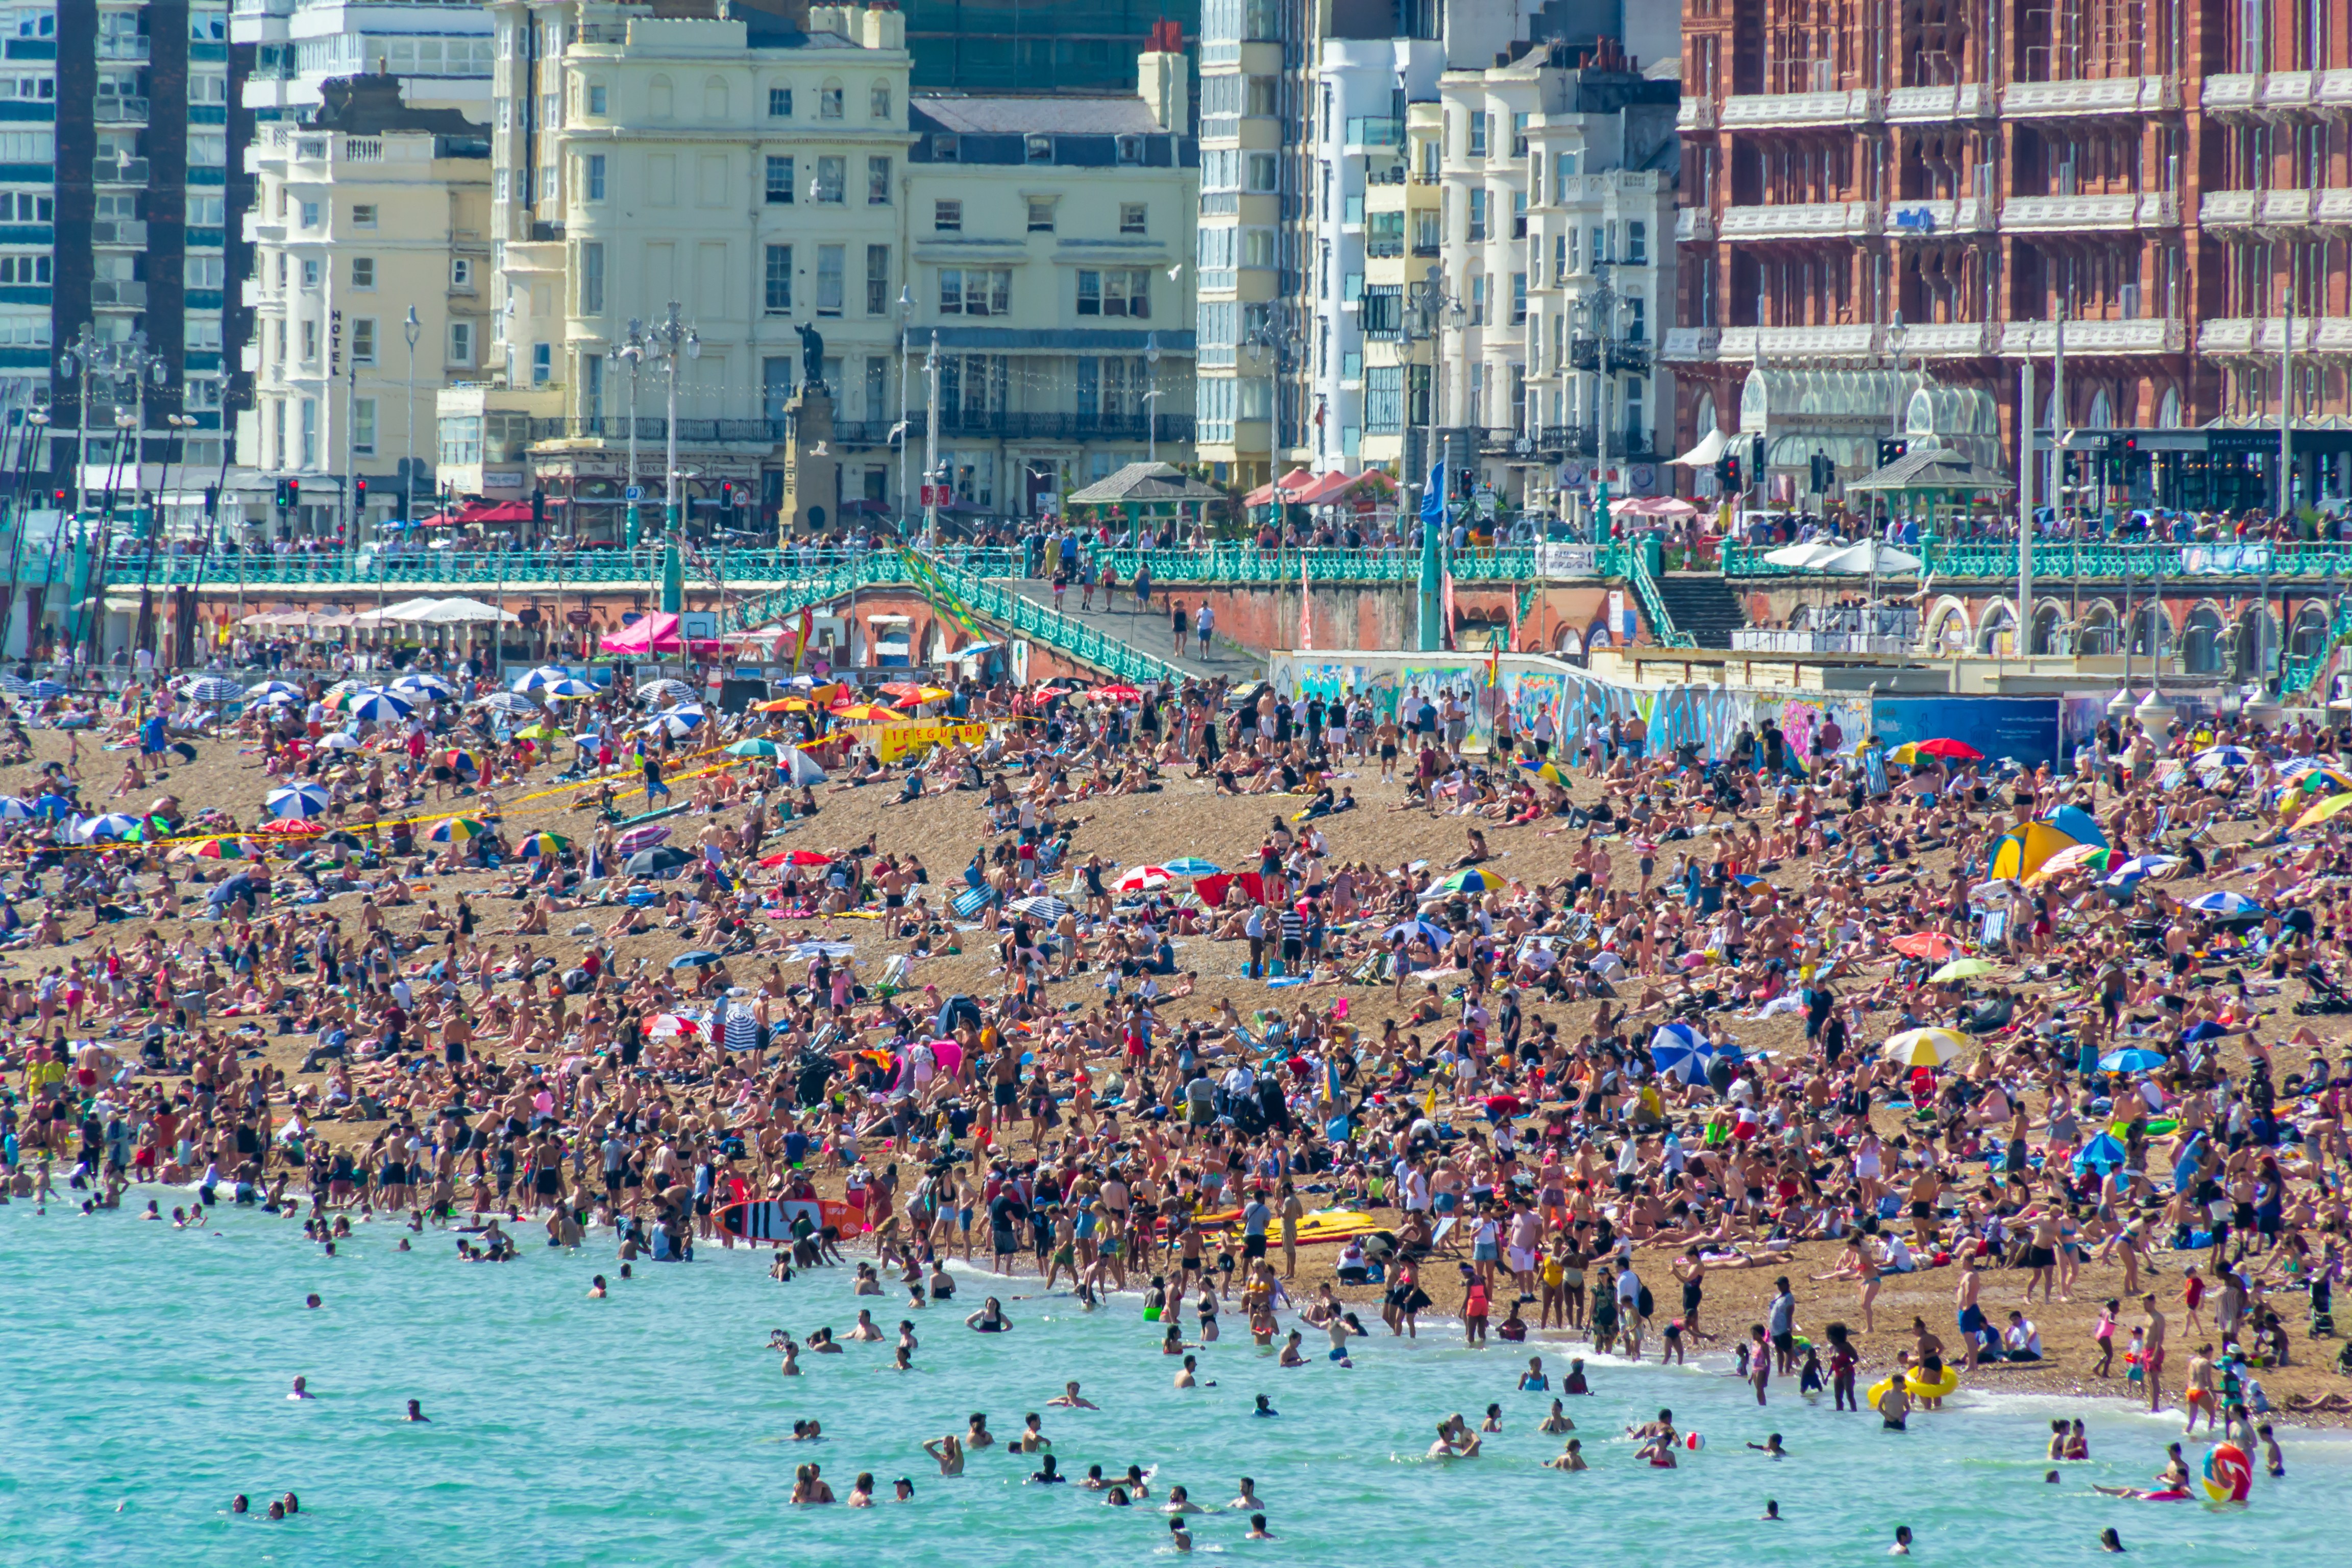 European heatwaves and health risks